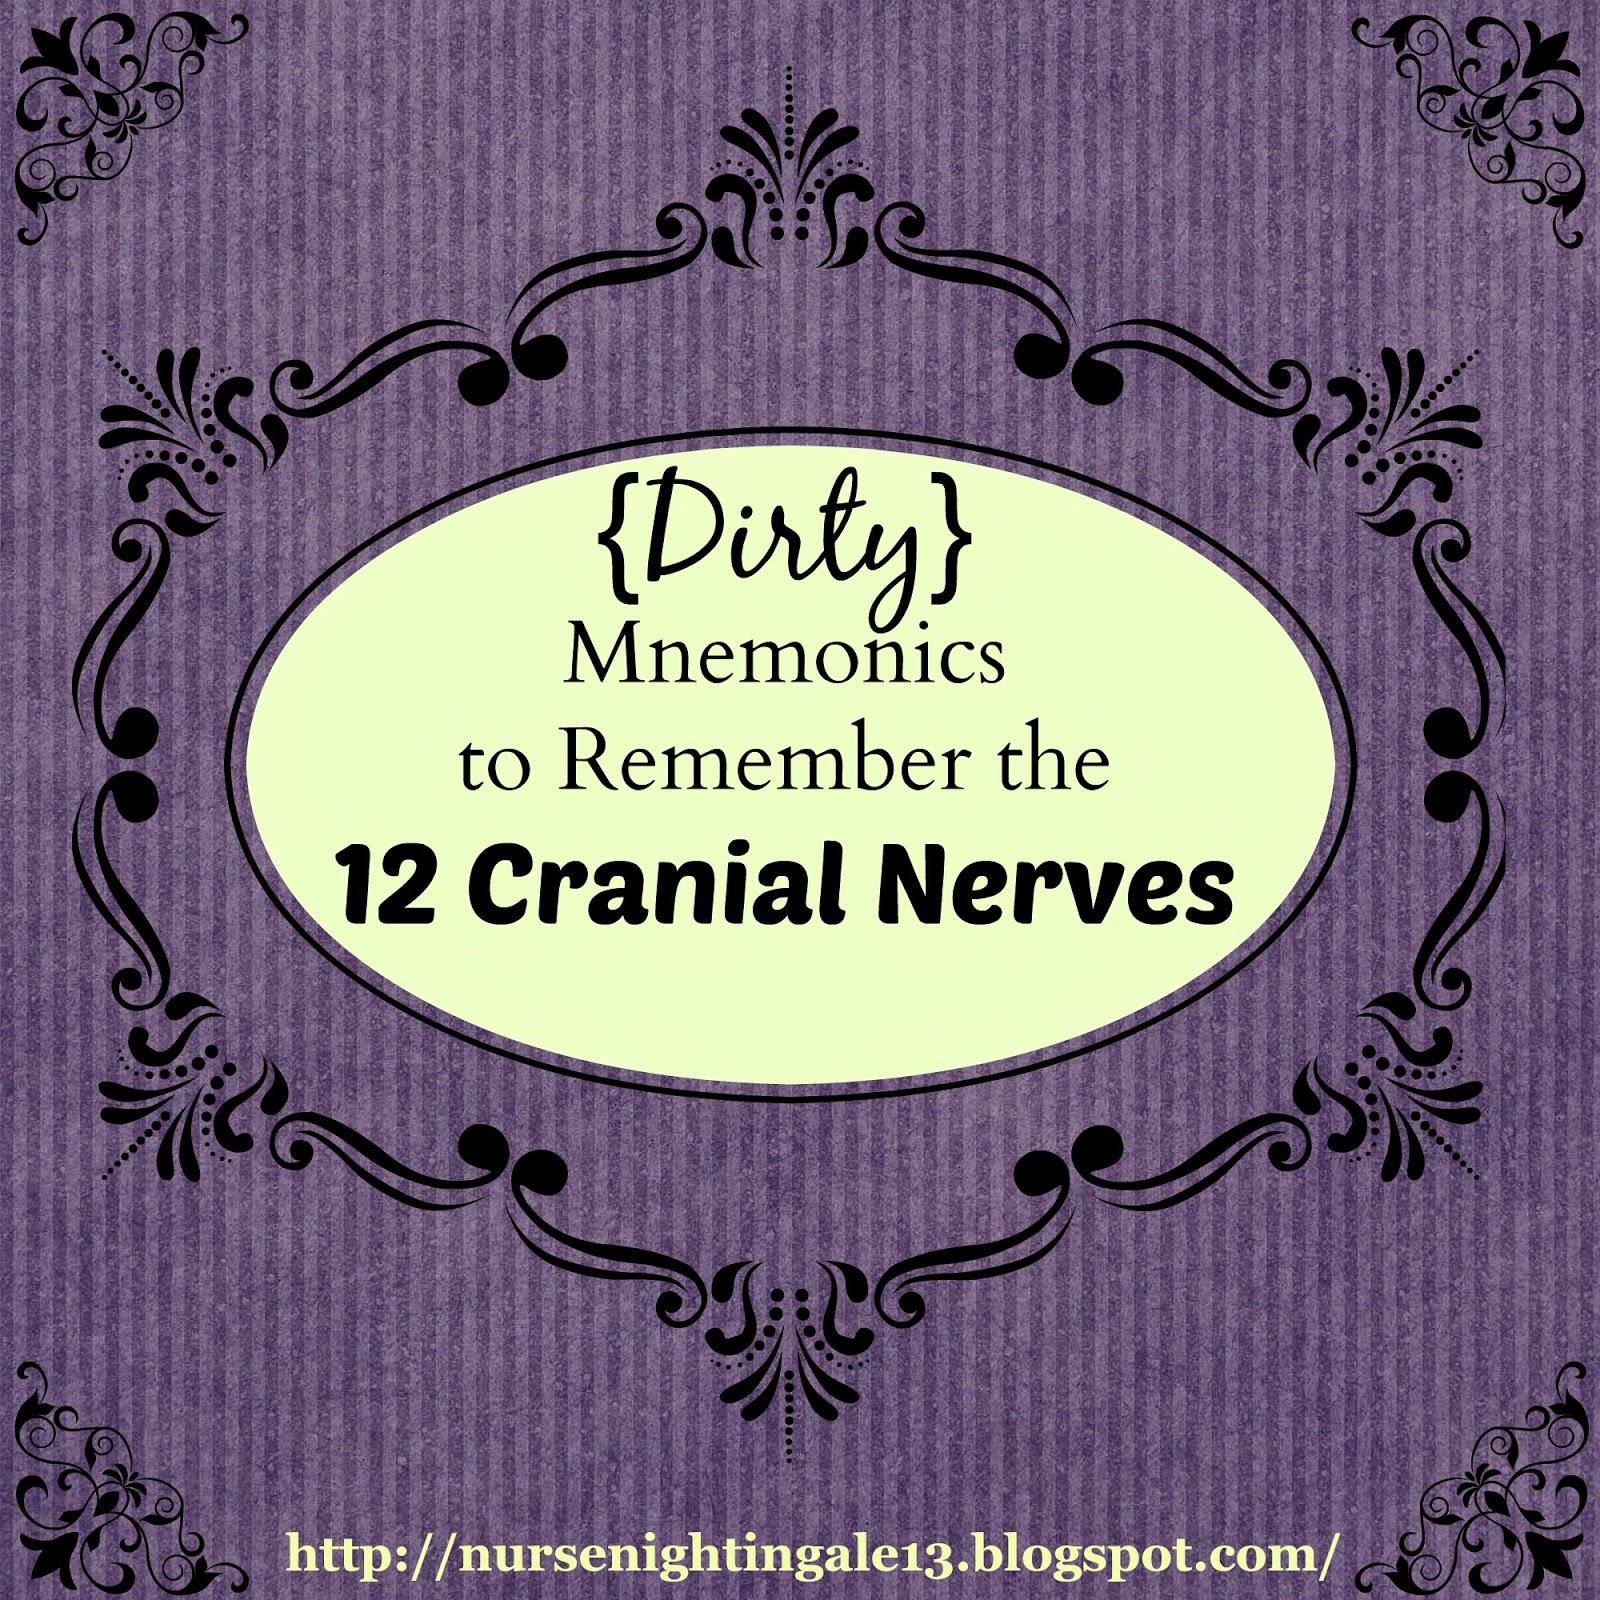 Nurse Nightingale: {Dirty} Mnemonics to Remember the 12 Cranial Nerves